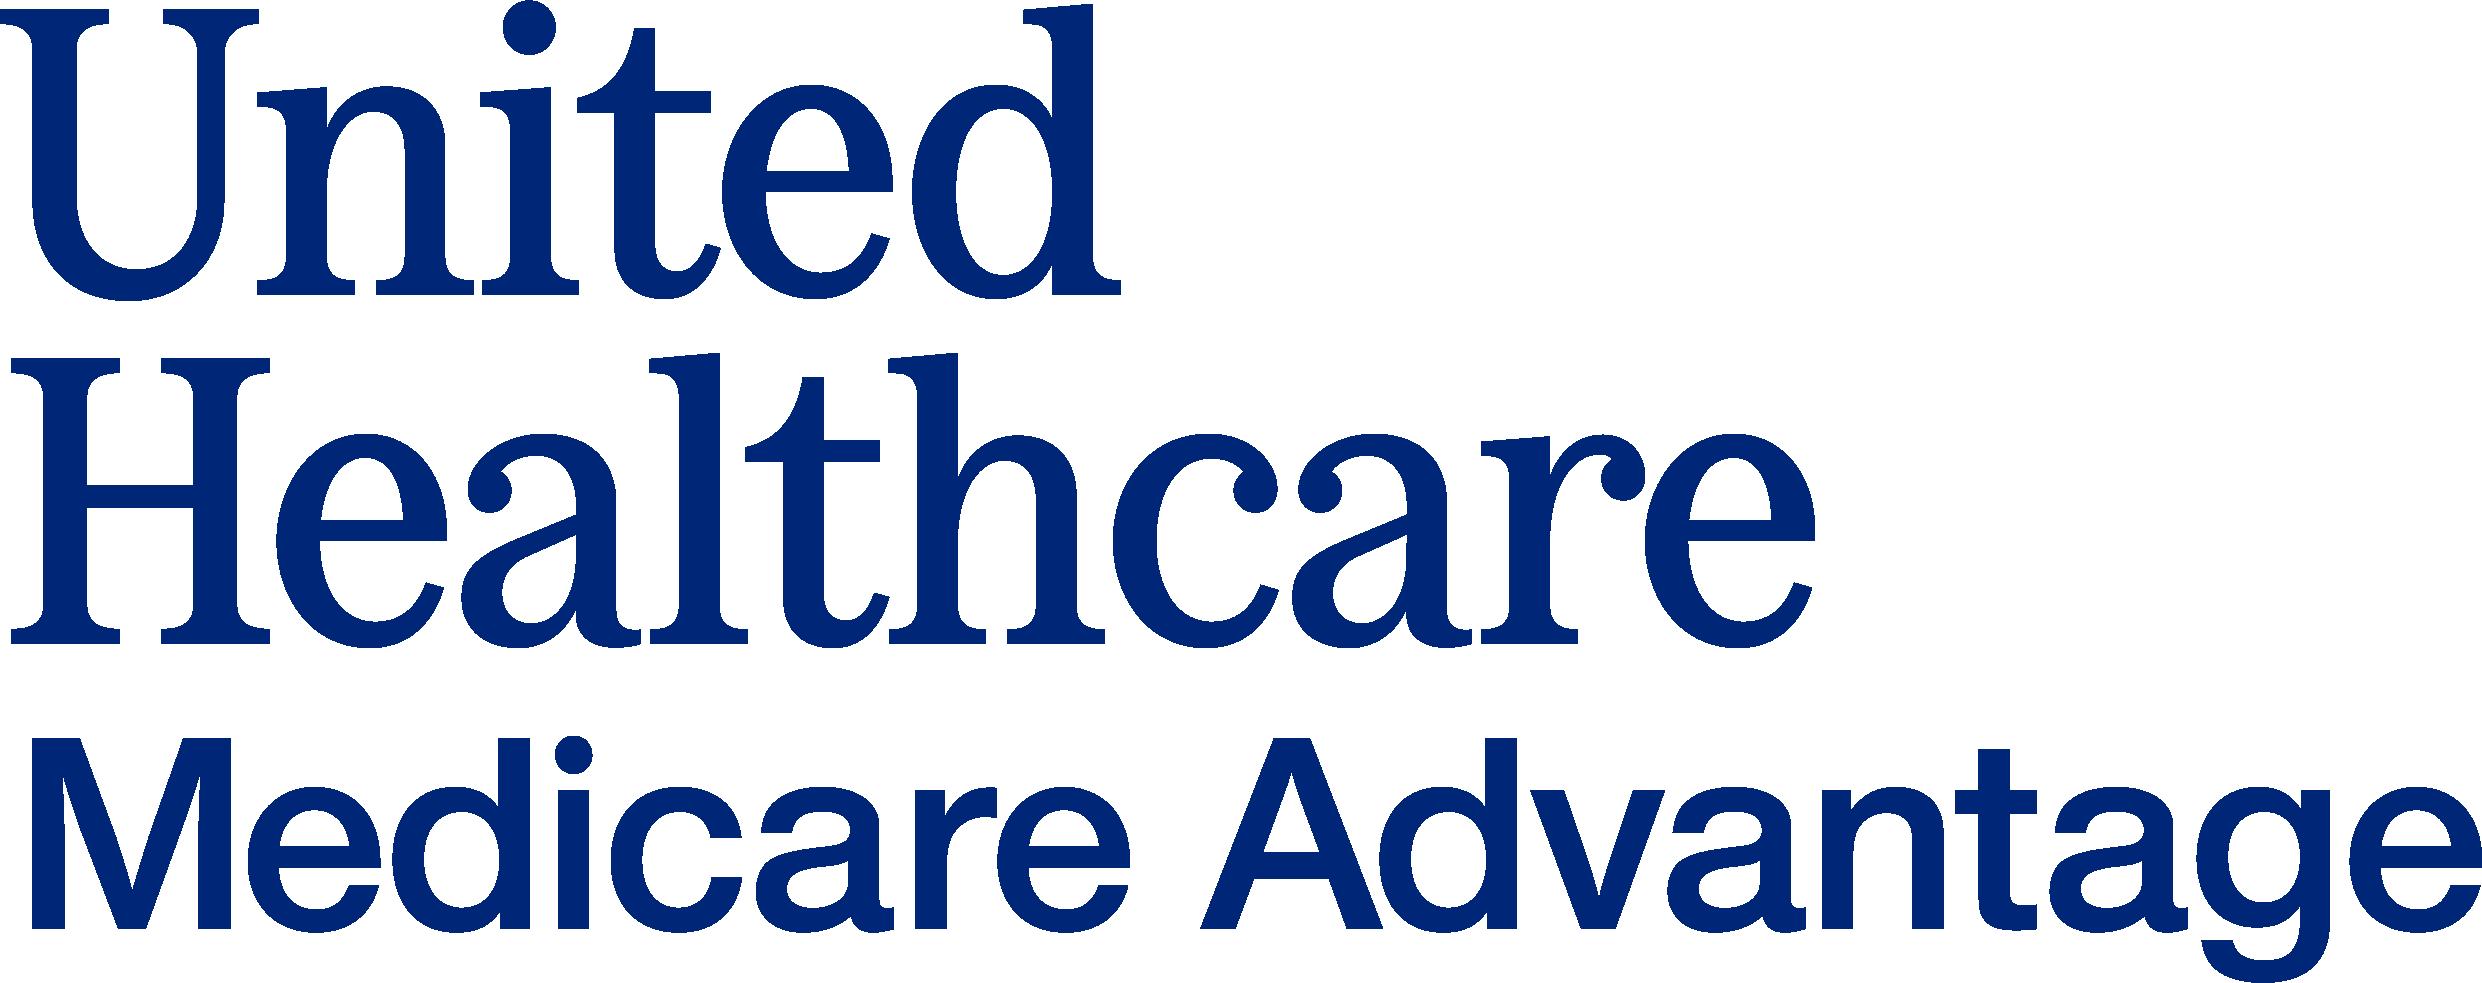 UHC_MedicareAdvantage_lockup_blu_RGB